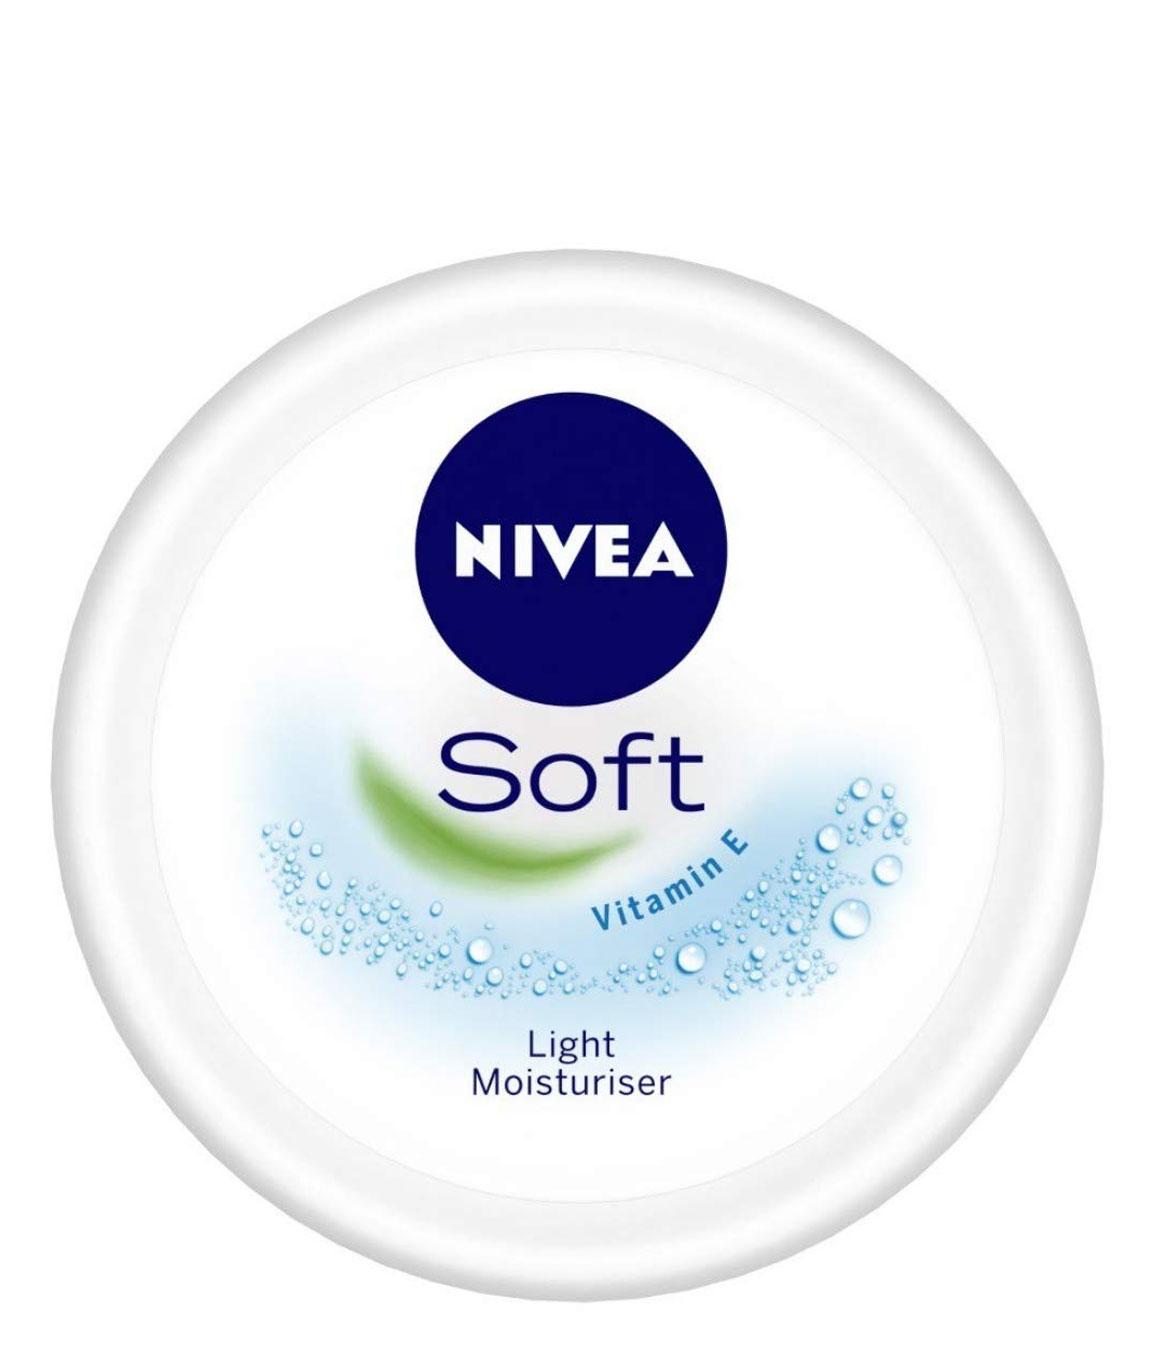 NIVEA Soft, Light Moisturising Cream, 50ml